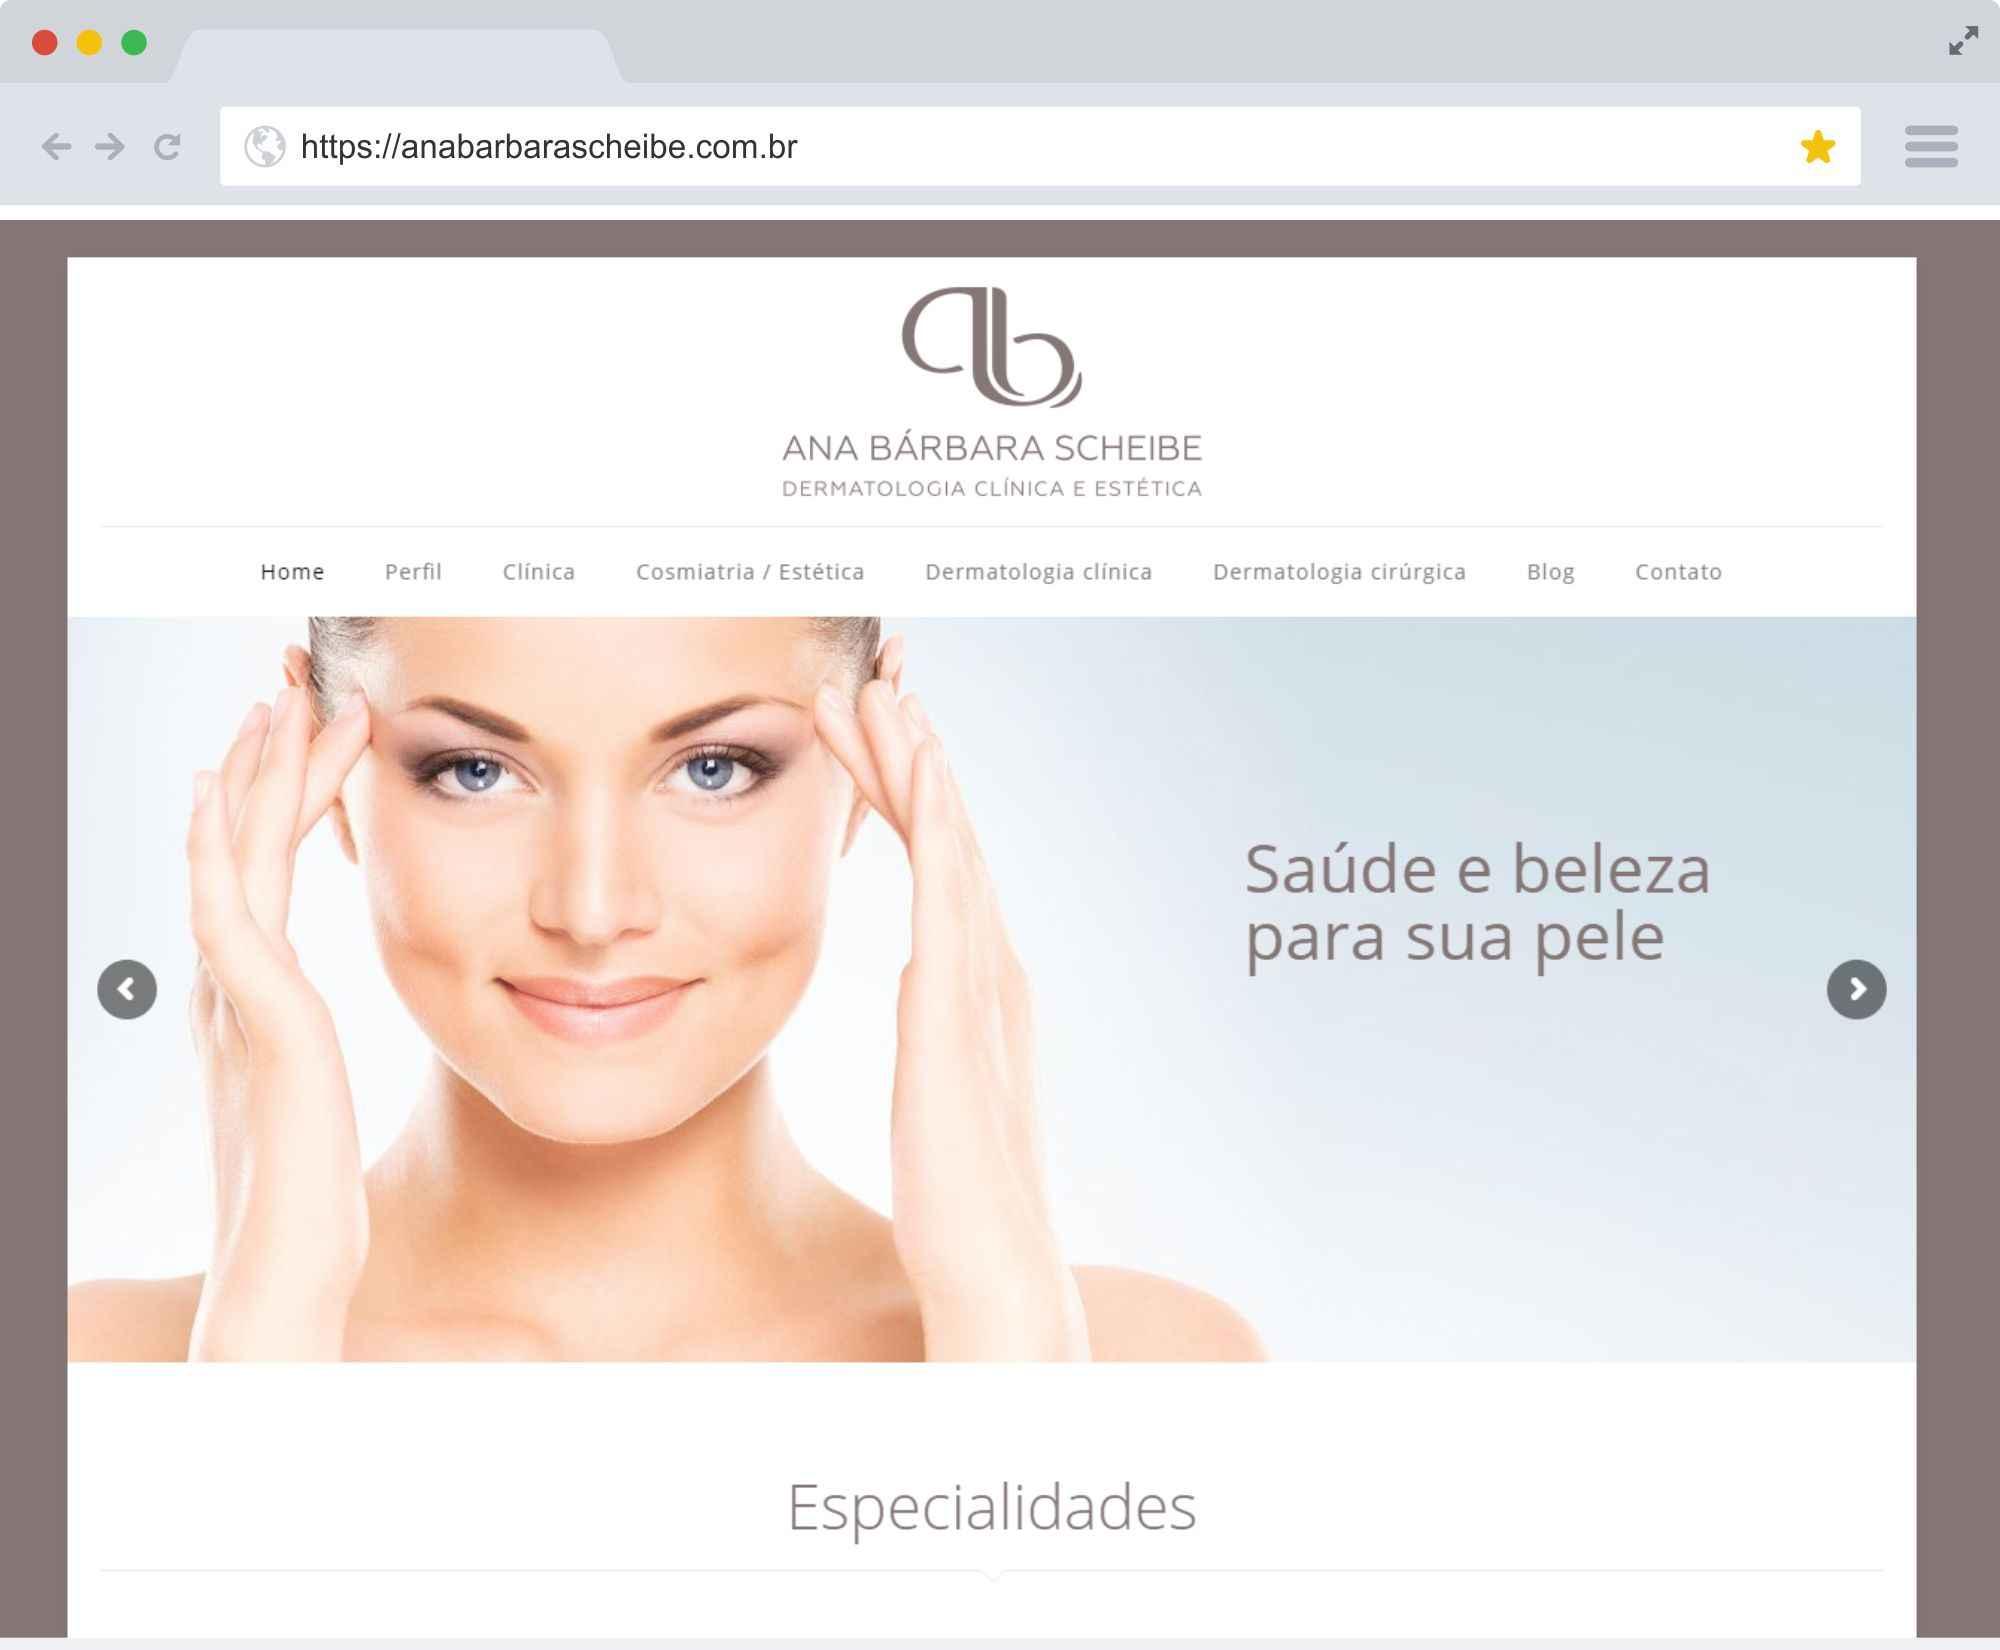 anabarbarascheibe.com.br